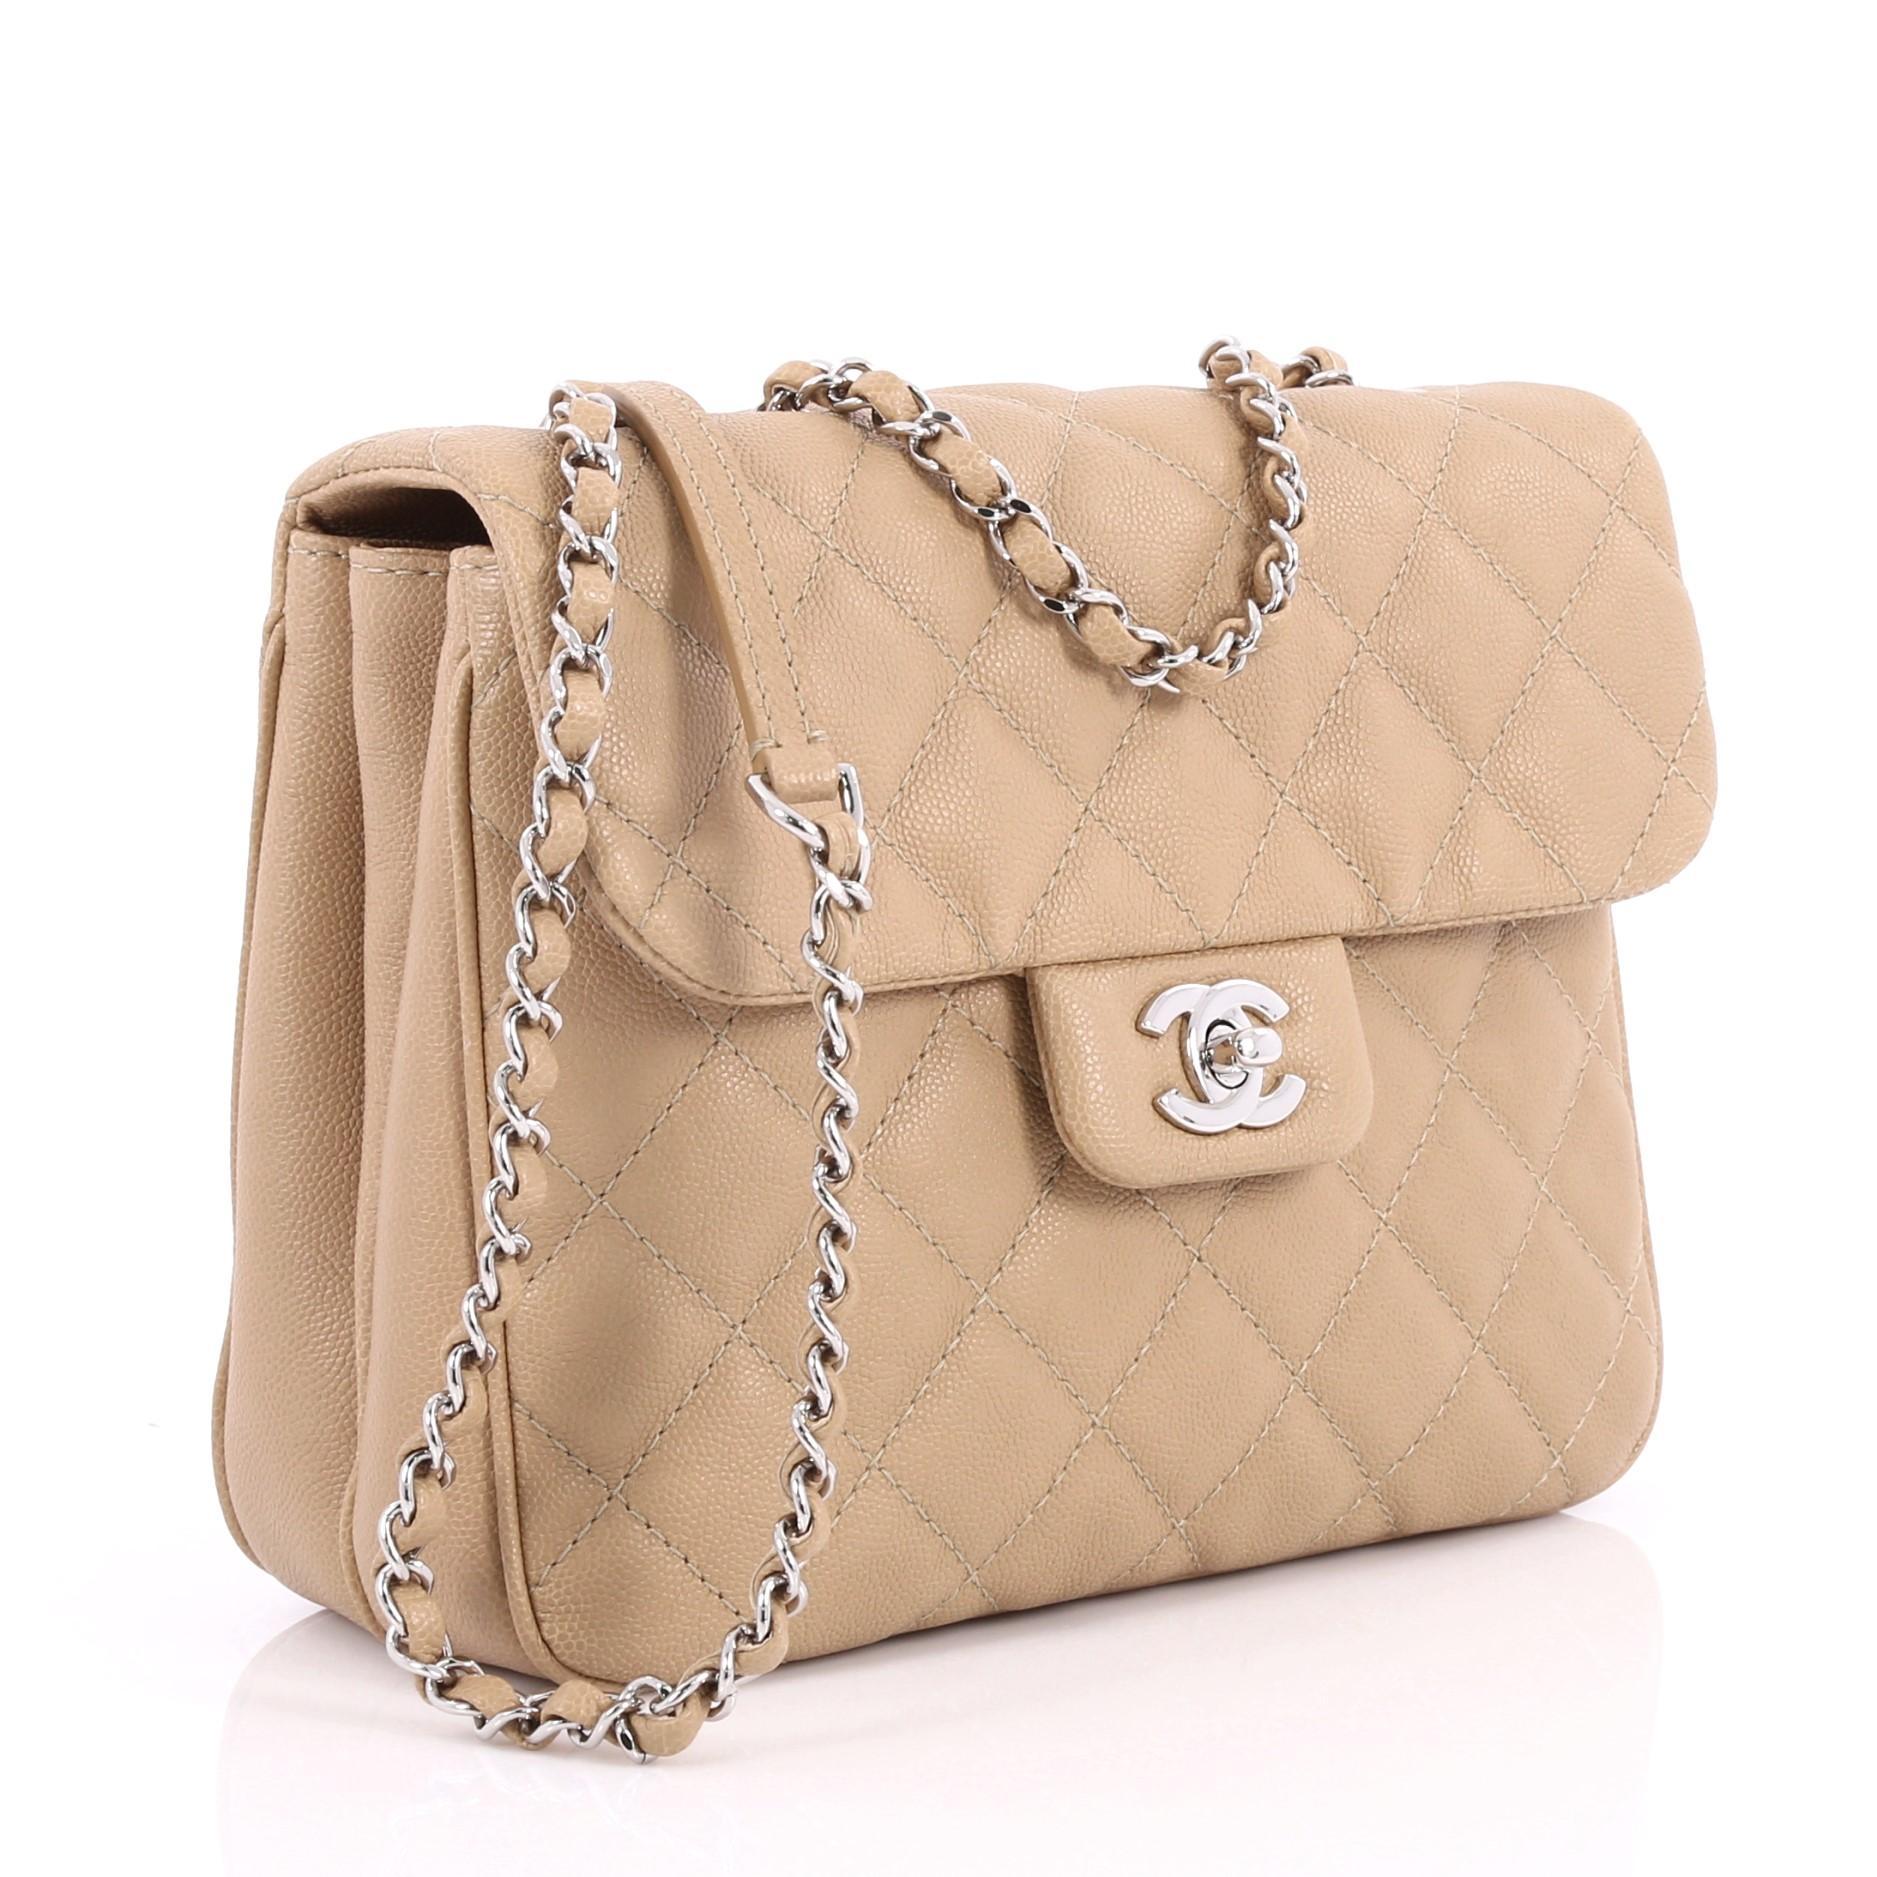 afa231203dea Chanel Urban Companion Flap Bag Quilted Caviar Small at 1stdibs